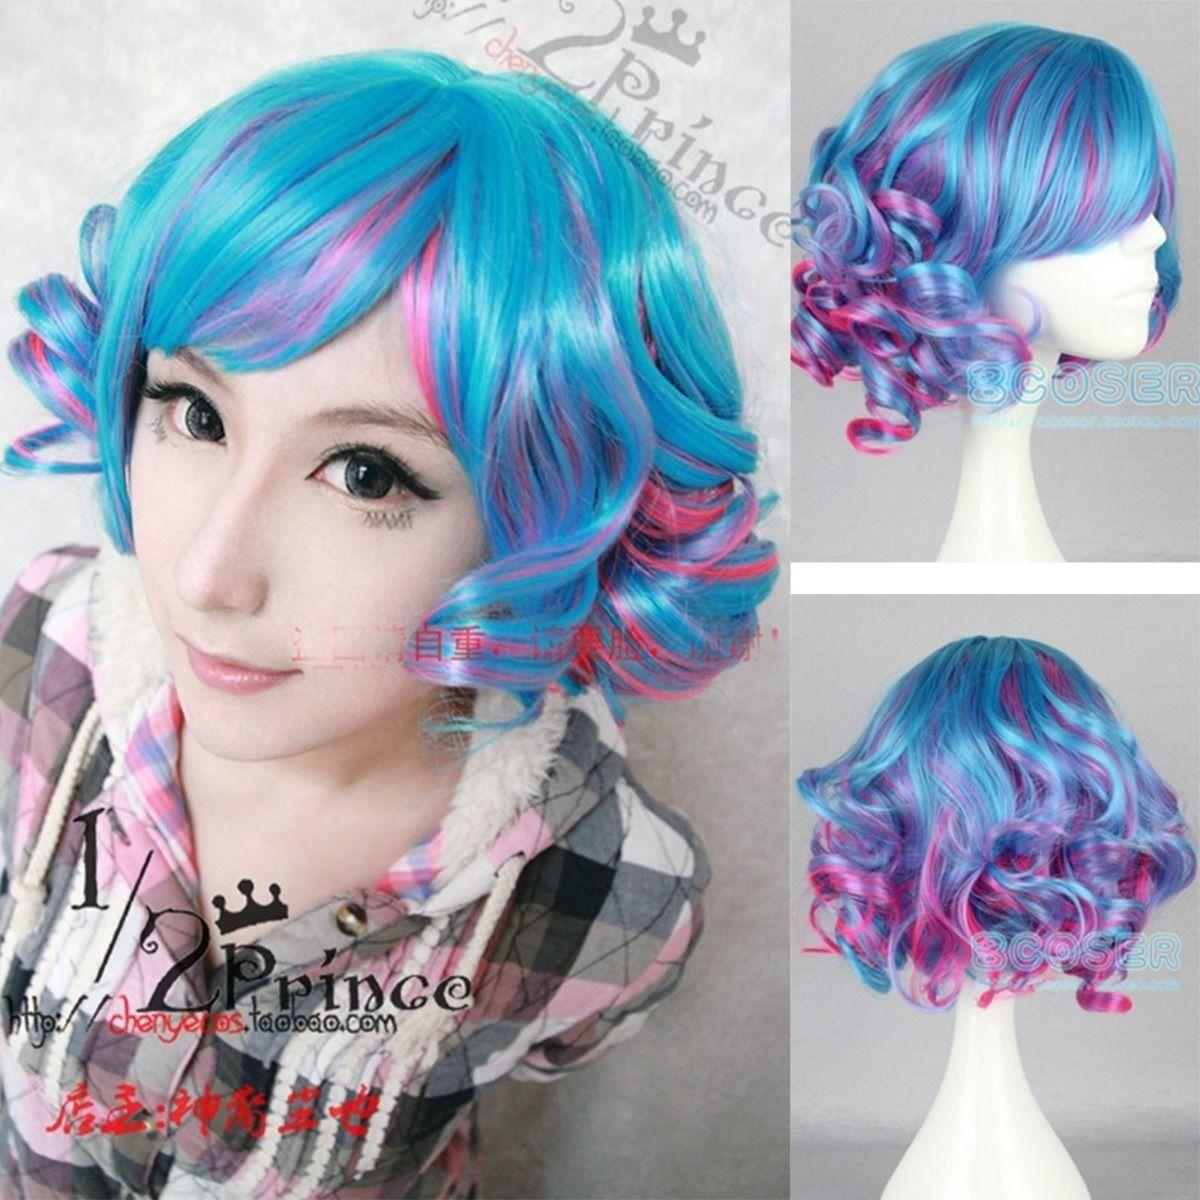 Farben Mischen Lolita Lockige Wellenförmige Kurze Haare